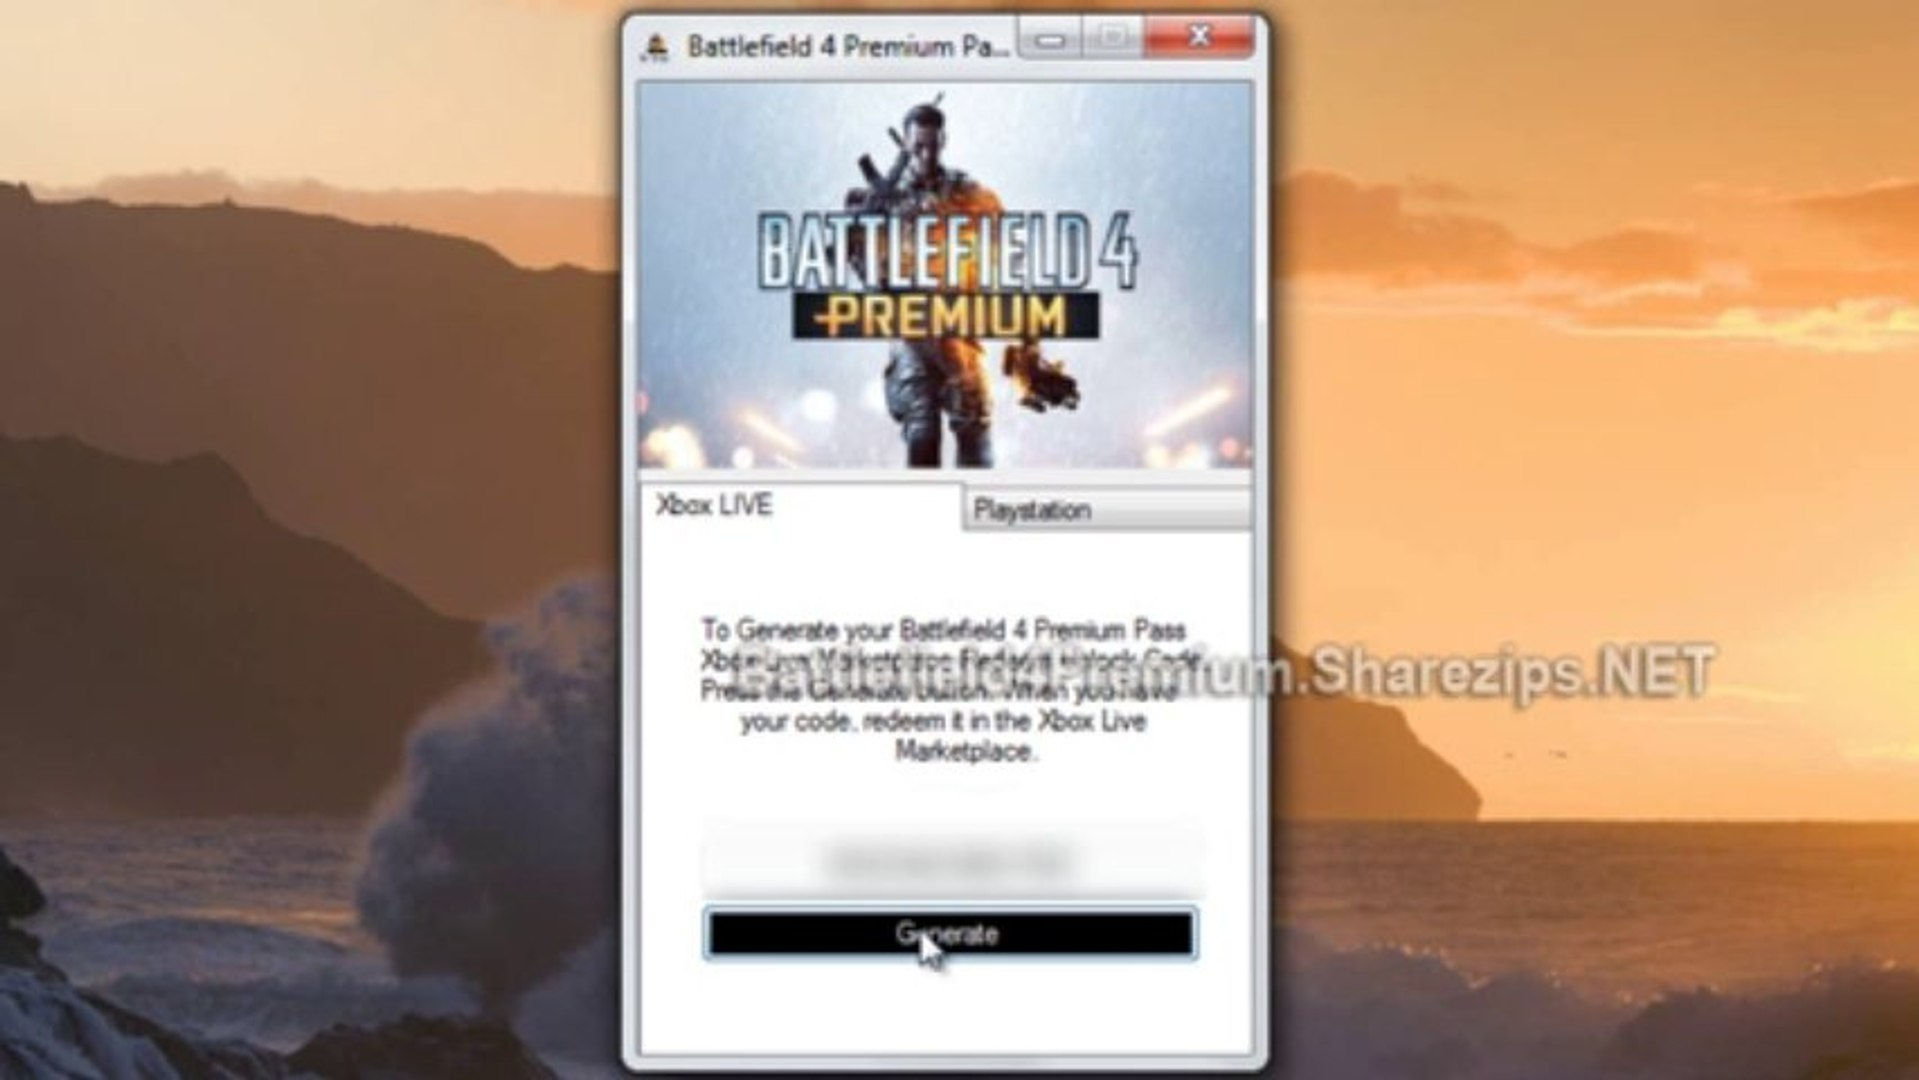 battlefield 4 premium ps4 code free